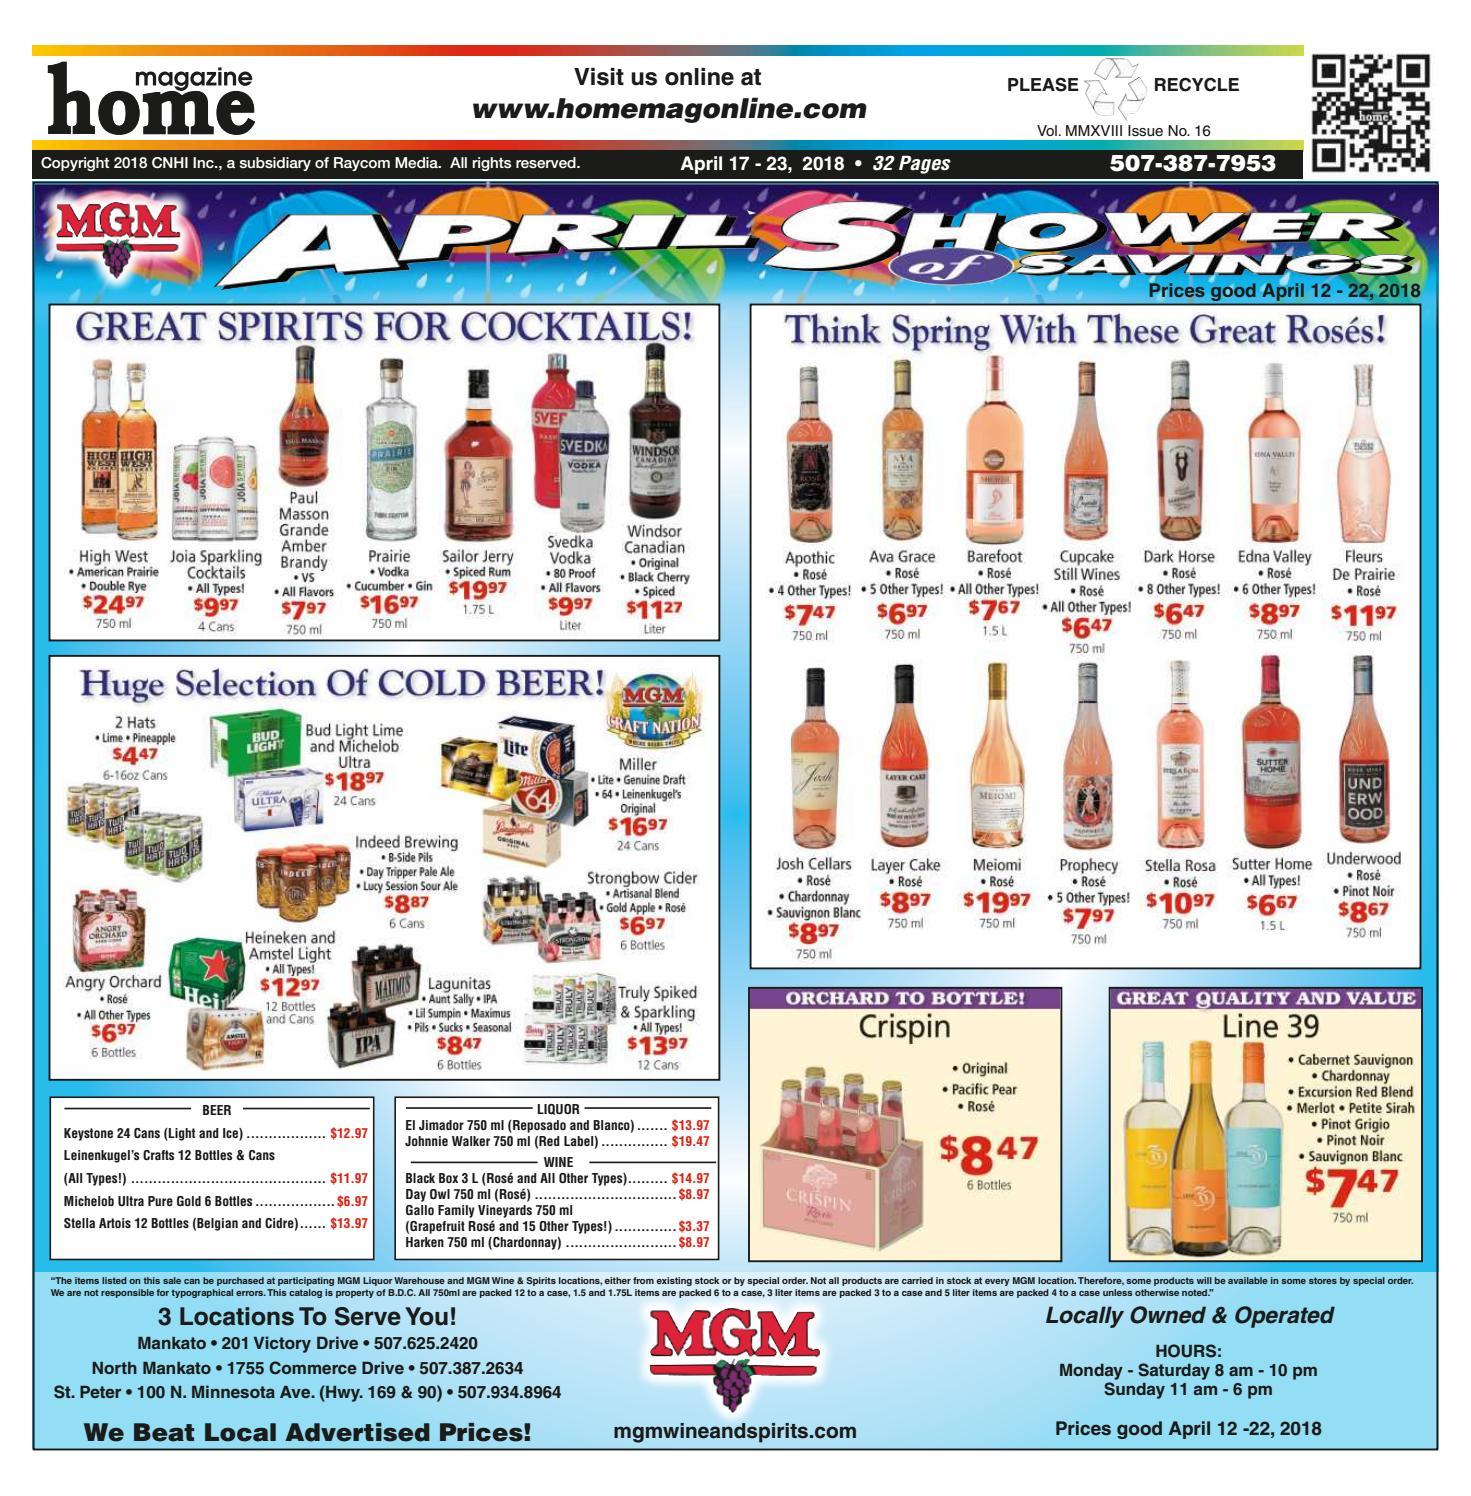 Home Magazine Issue 04/17/18 by Home Magazine Online - issuu